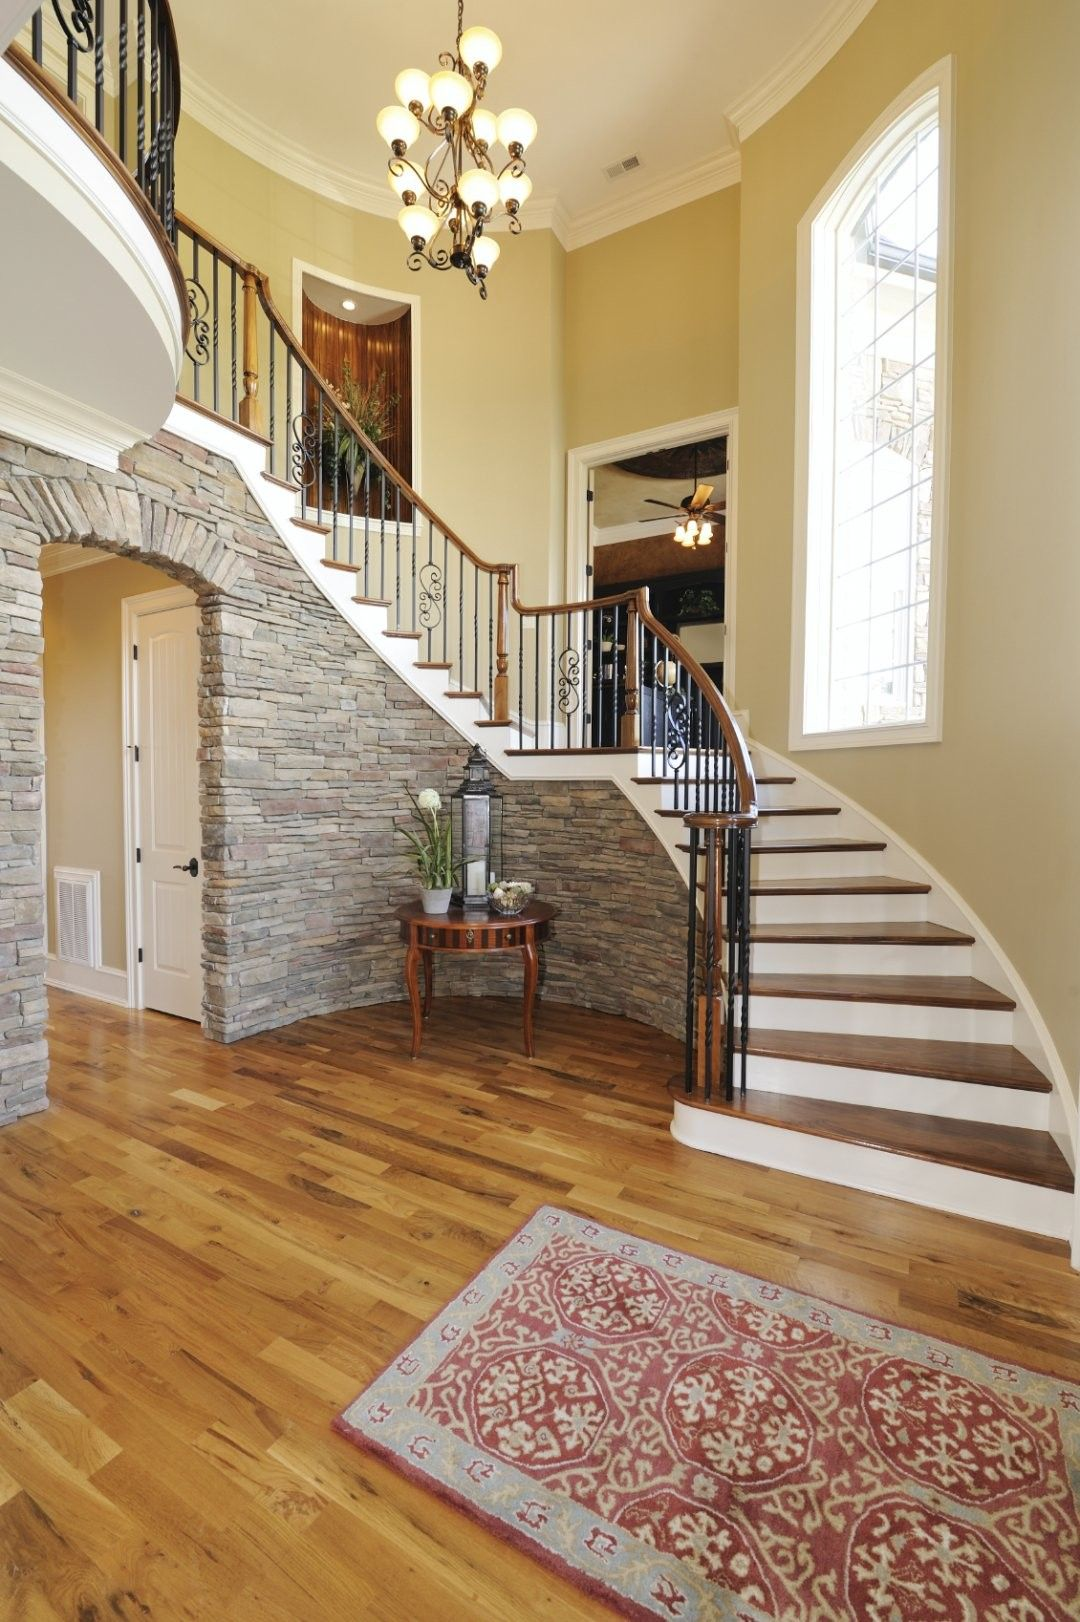 Best 30 Creative Stair Decoration Ideas Stair Decor Faux 400 x 300